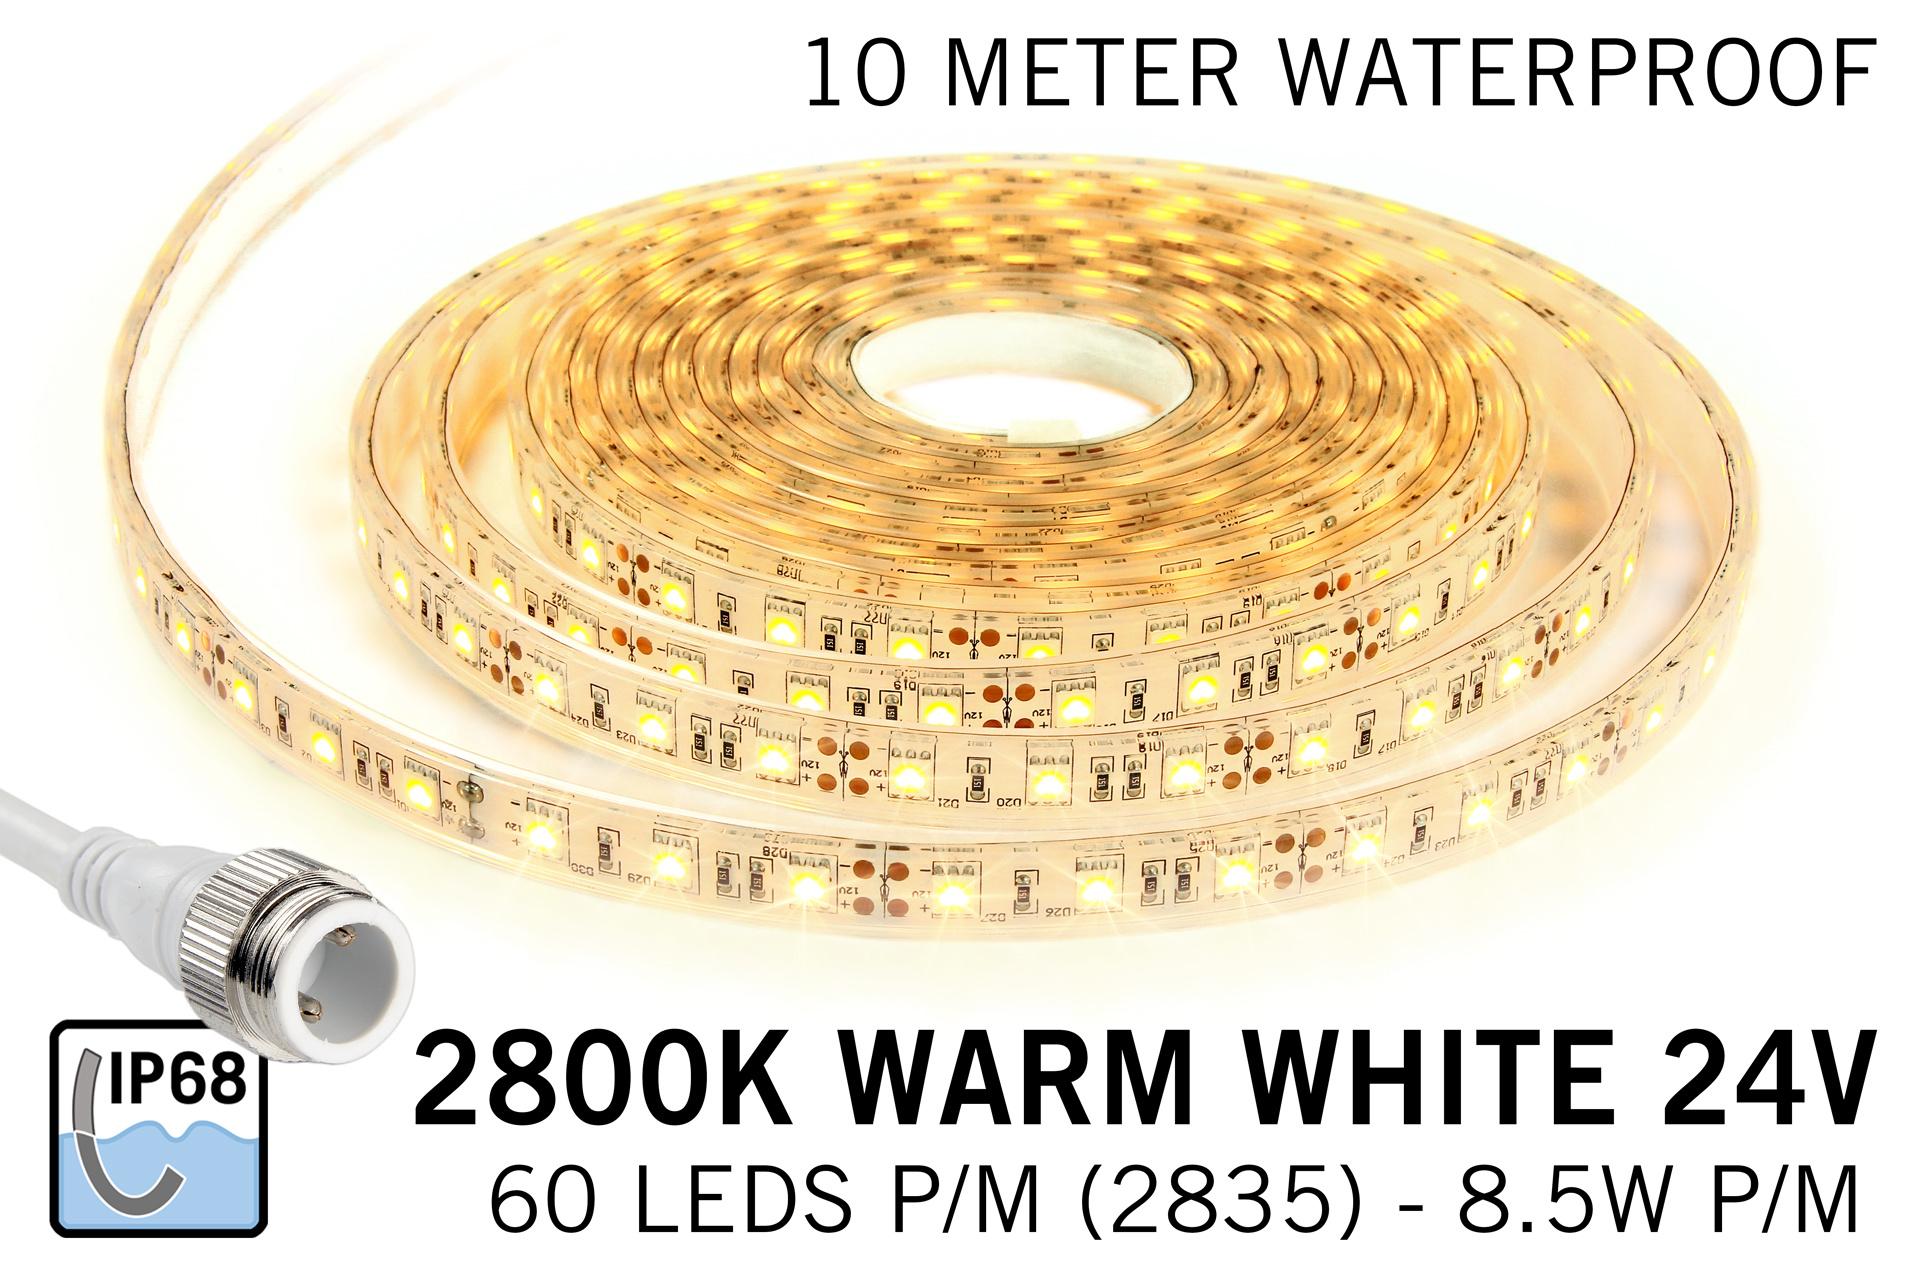 Waterdichte Warm Witte LED strip (IP68) 60 Led's per meter 24Volt, 10 meter lengte